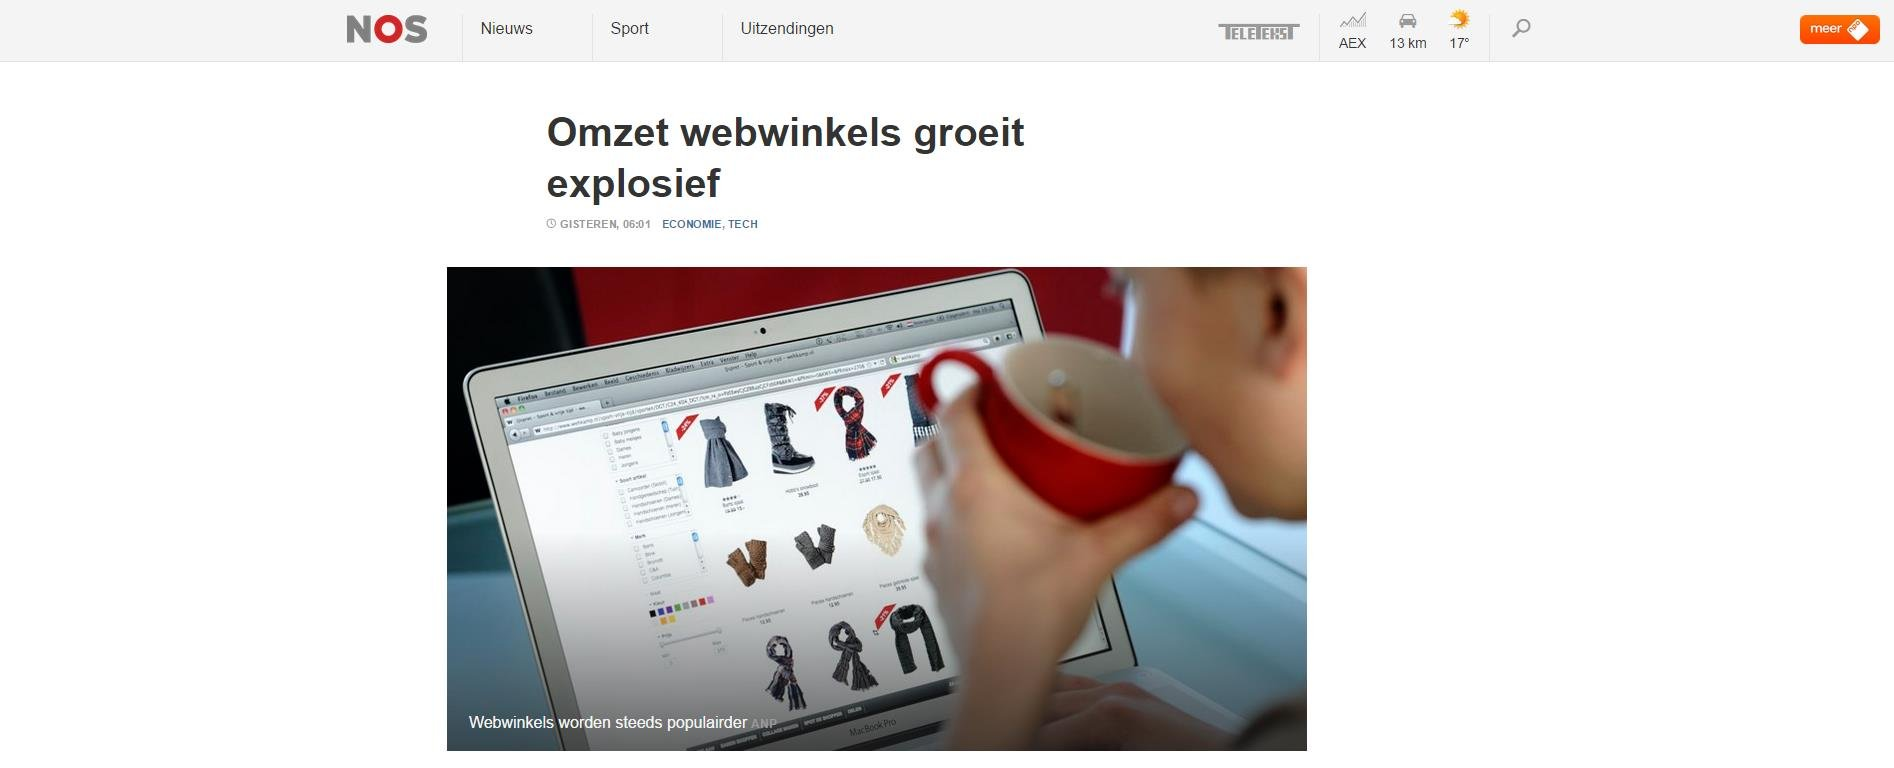 Omzet webwinkels groeit explosief – NOS